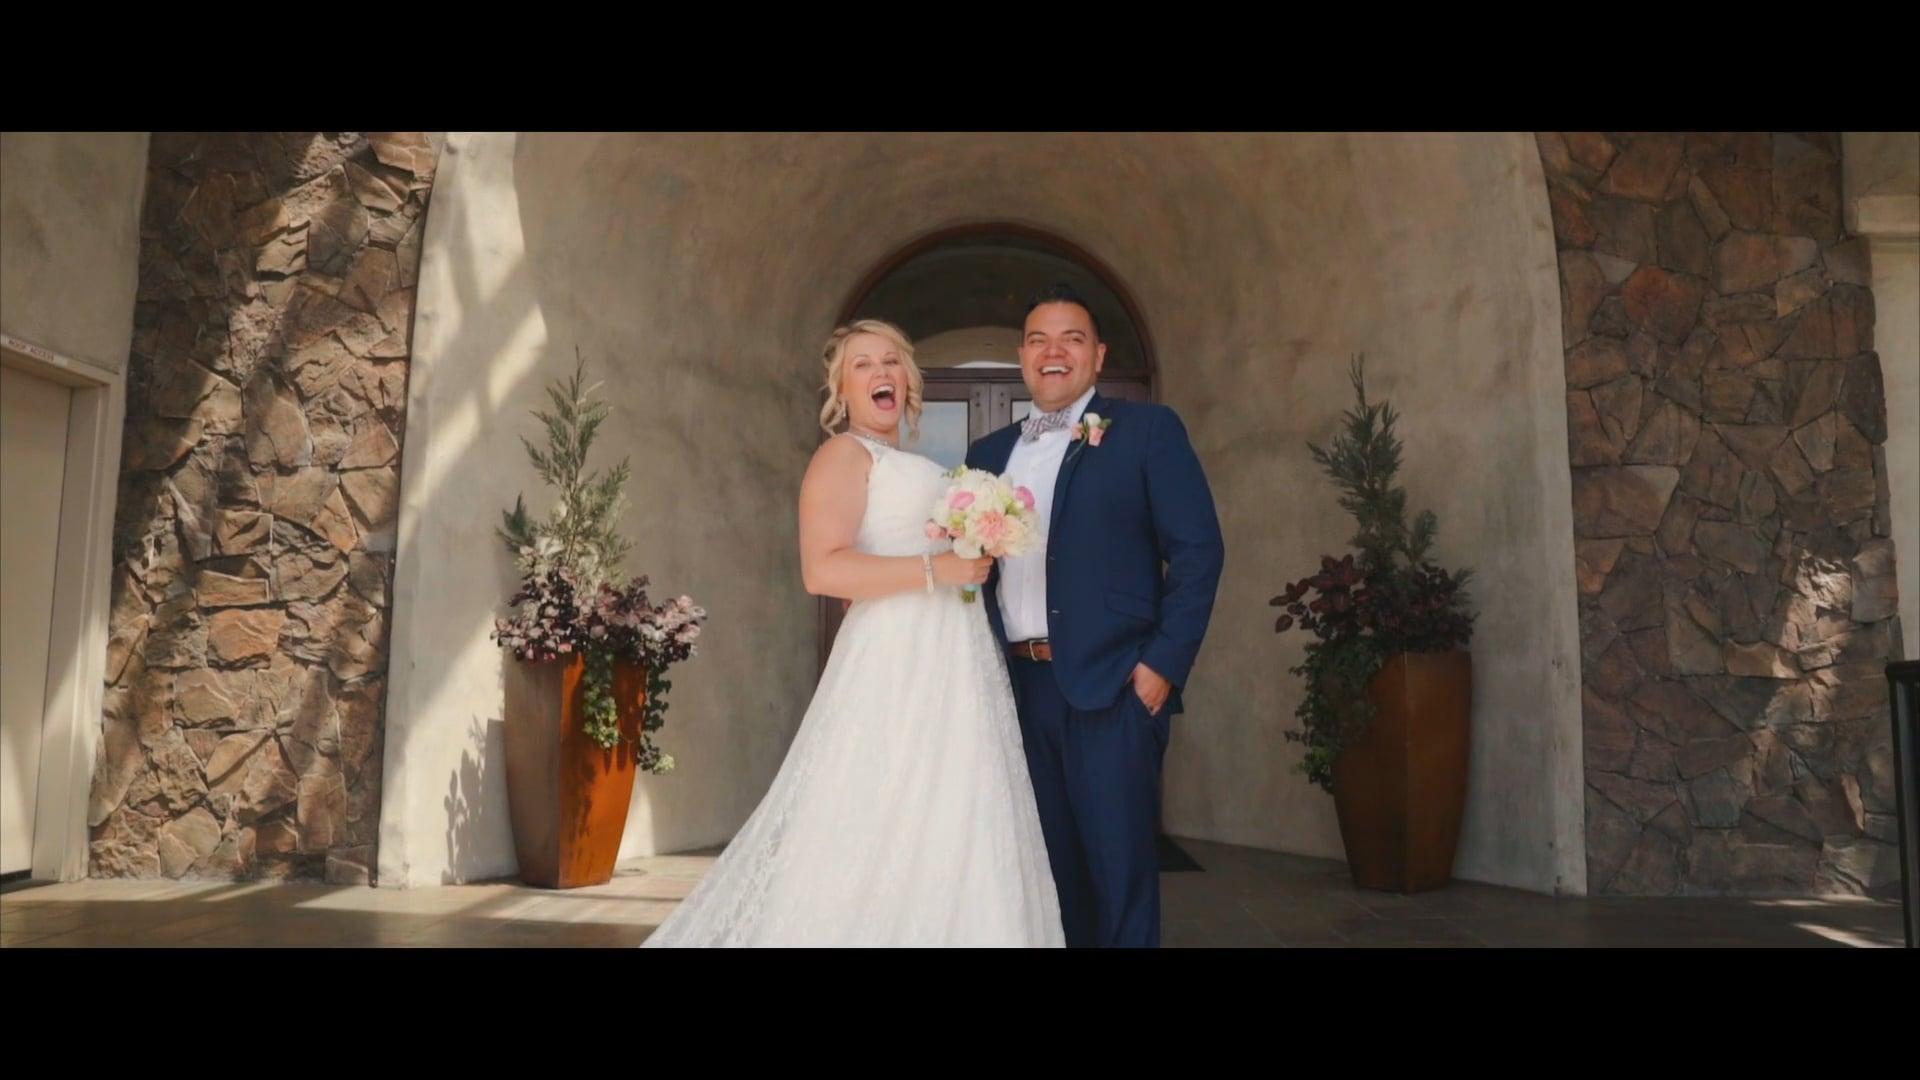 Marvin & Sandy's Wedding Video